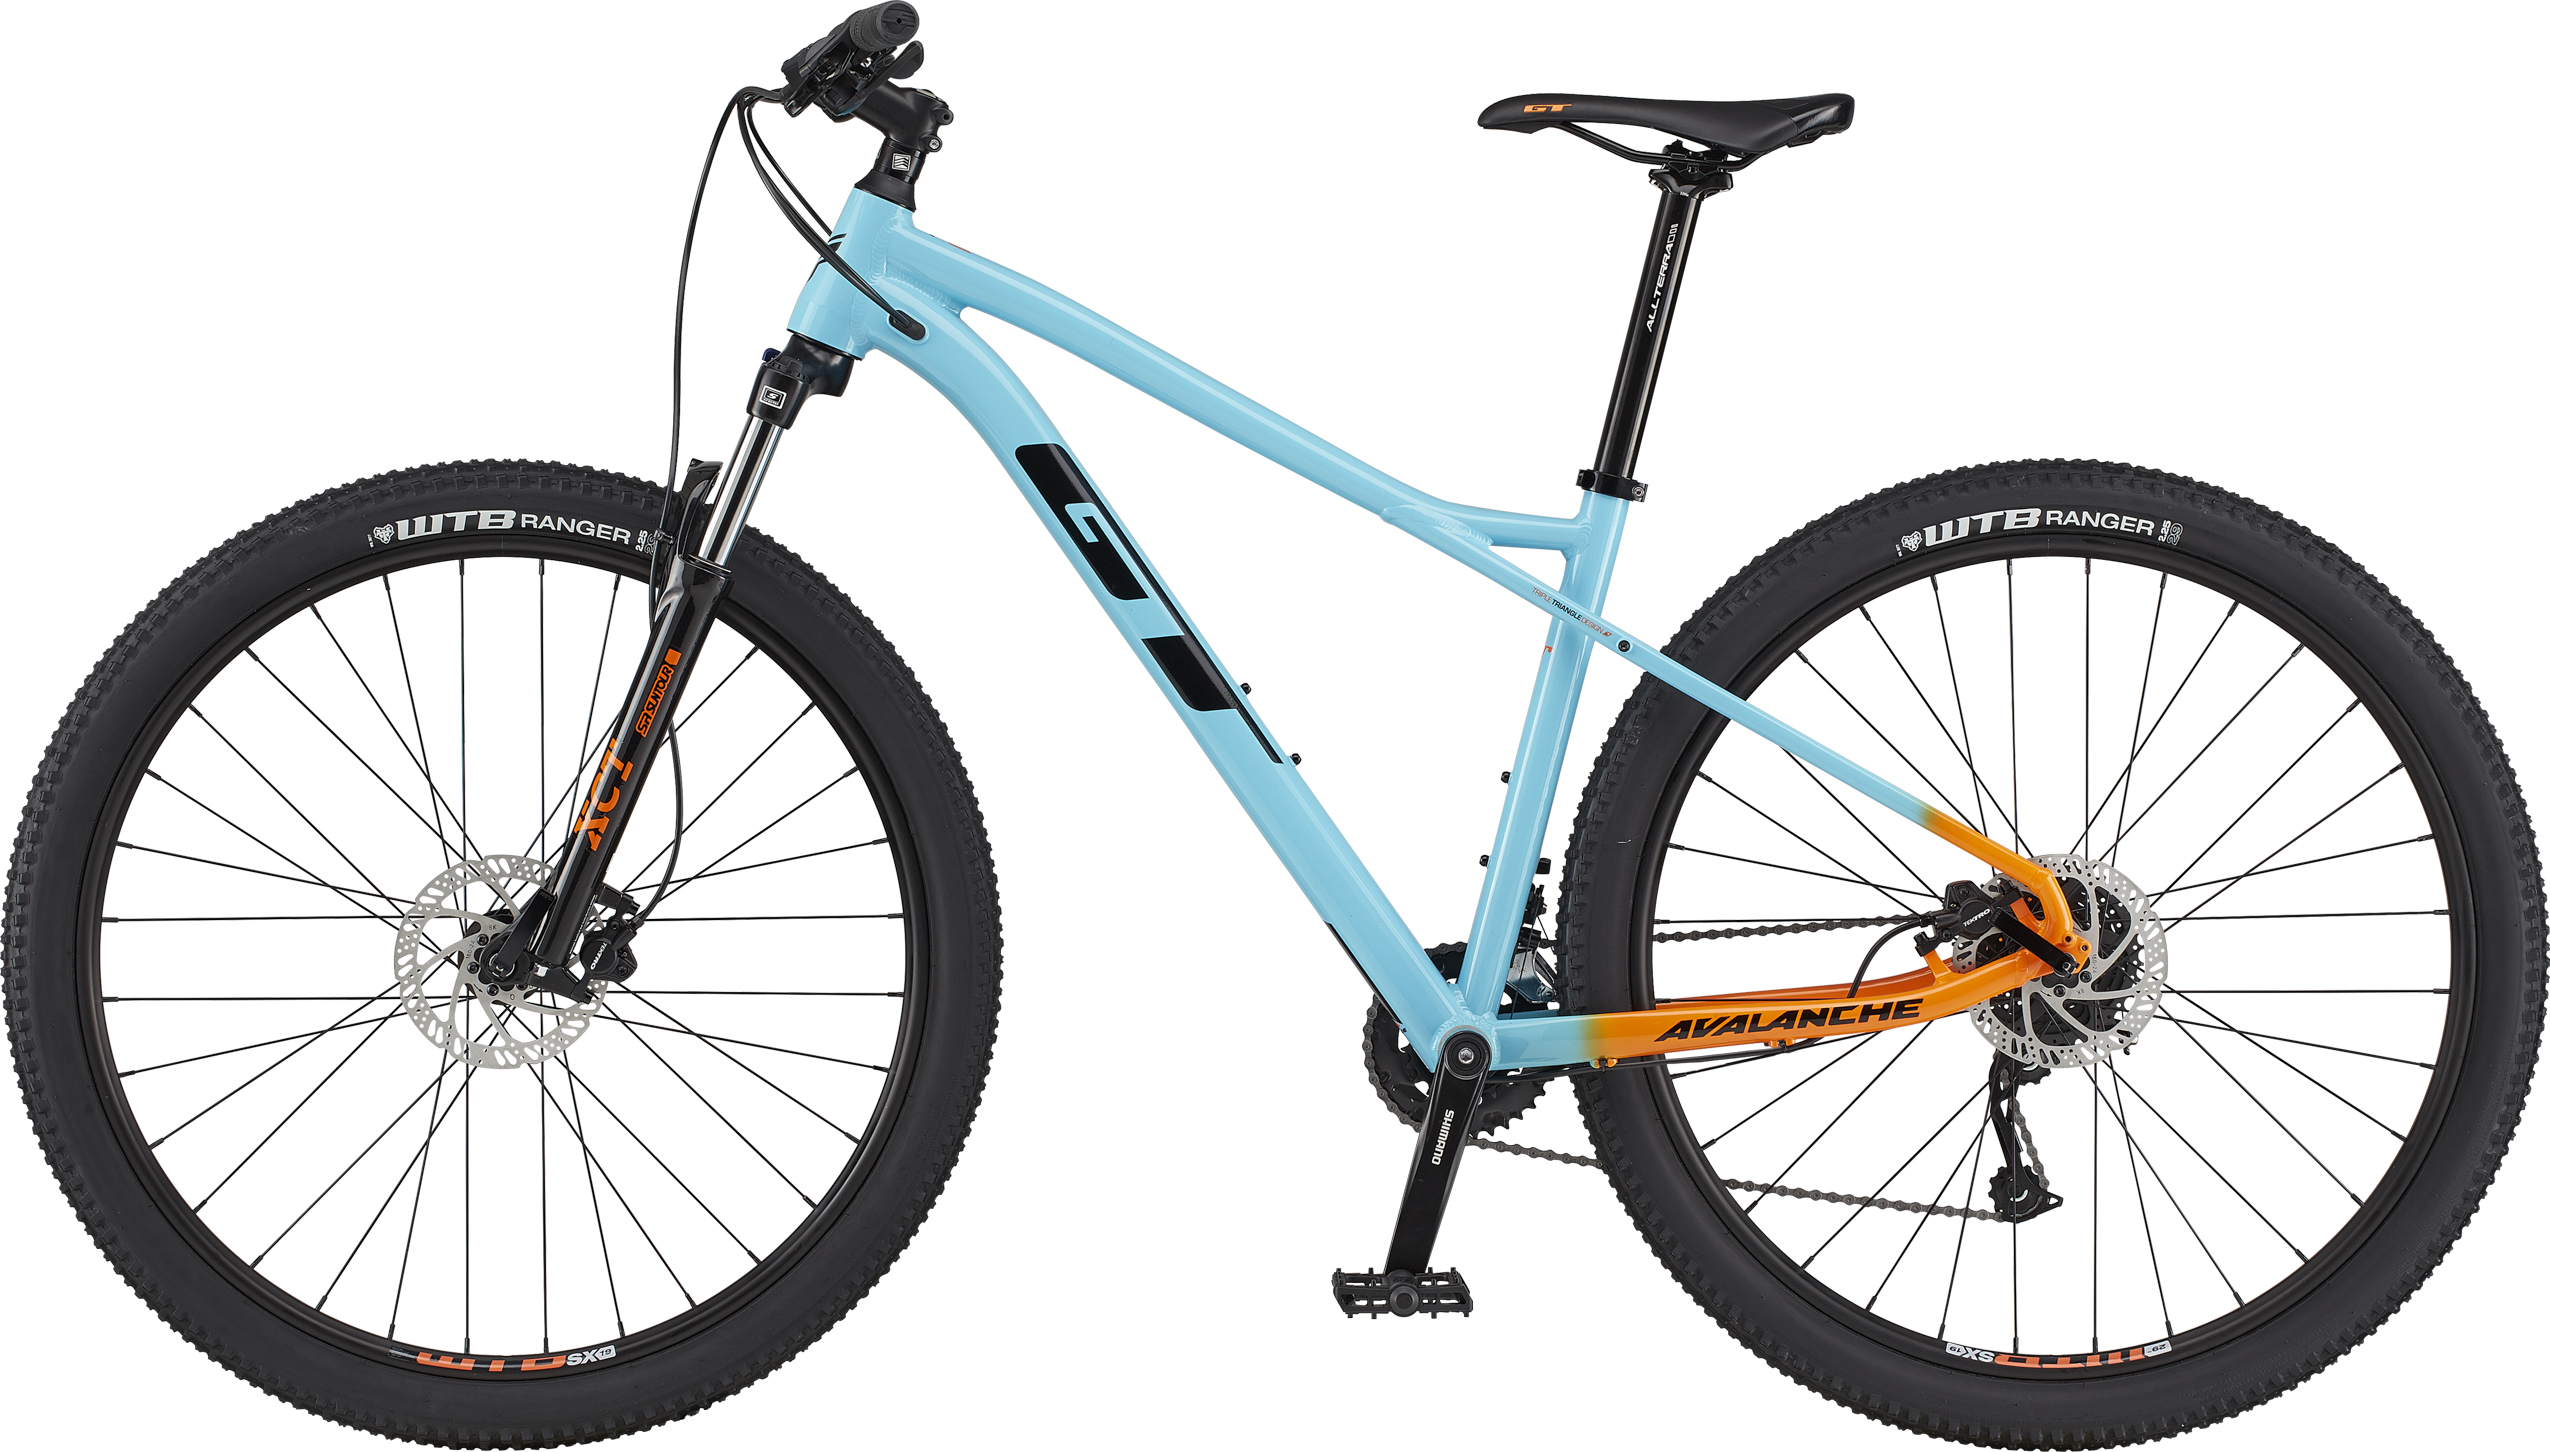 Aluminium CNC Brompton Bicycle Brake Caliper Space light bracket front F